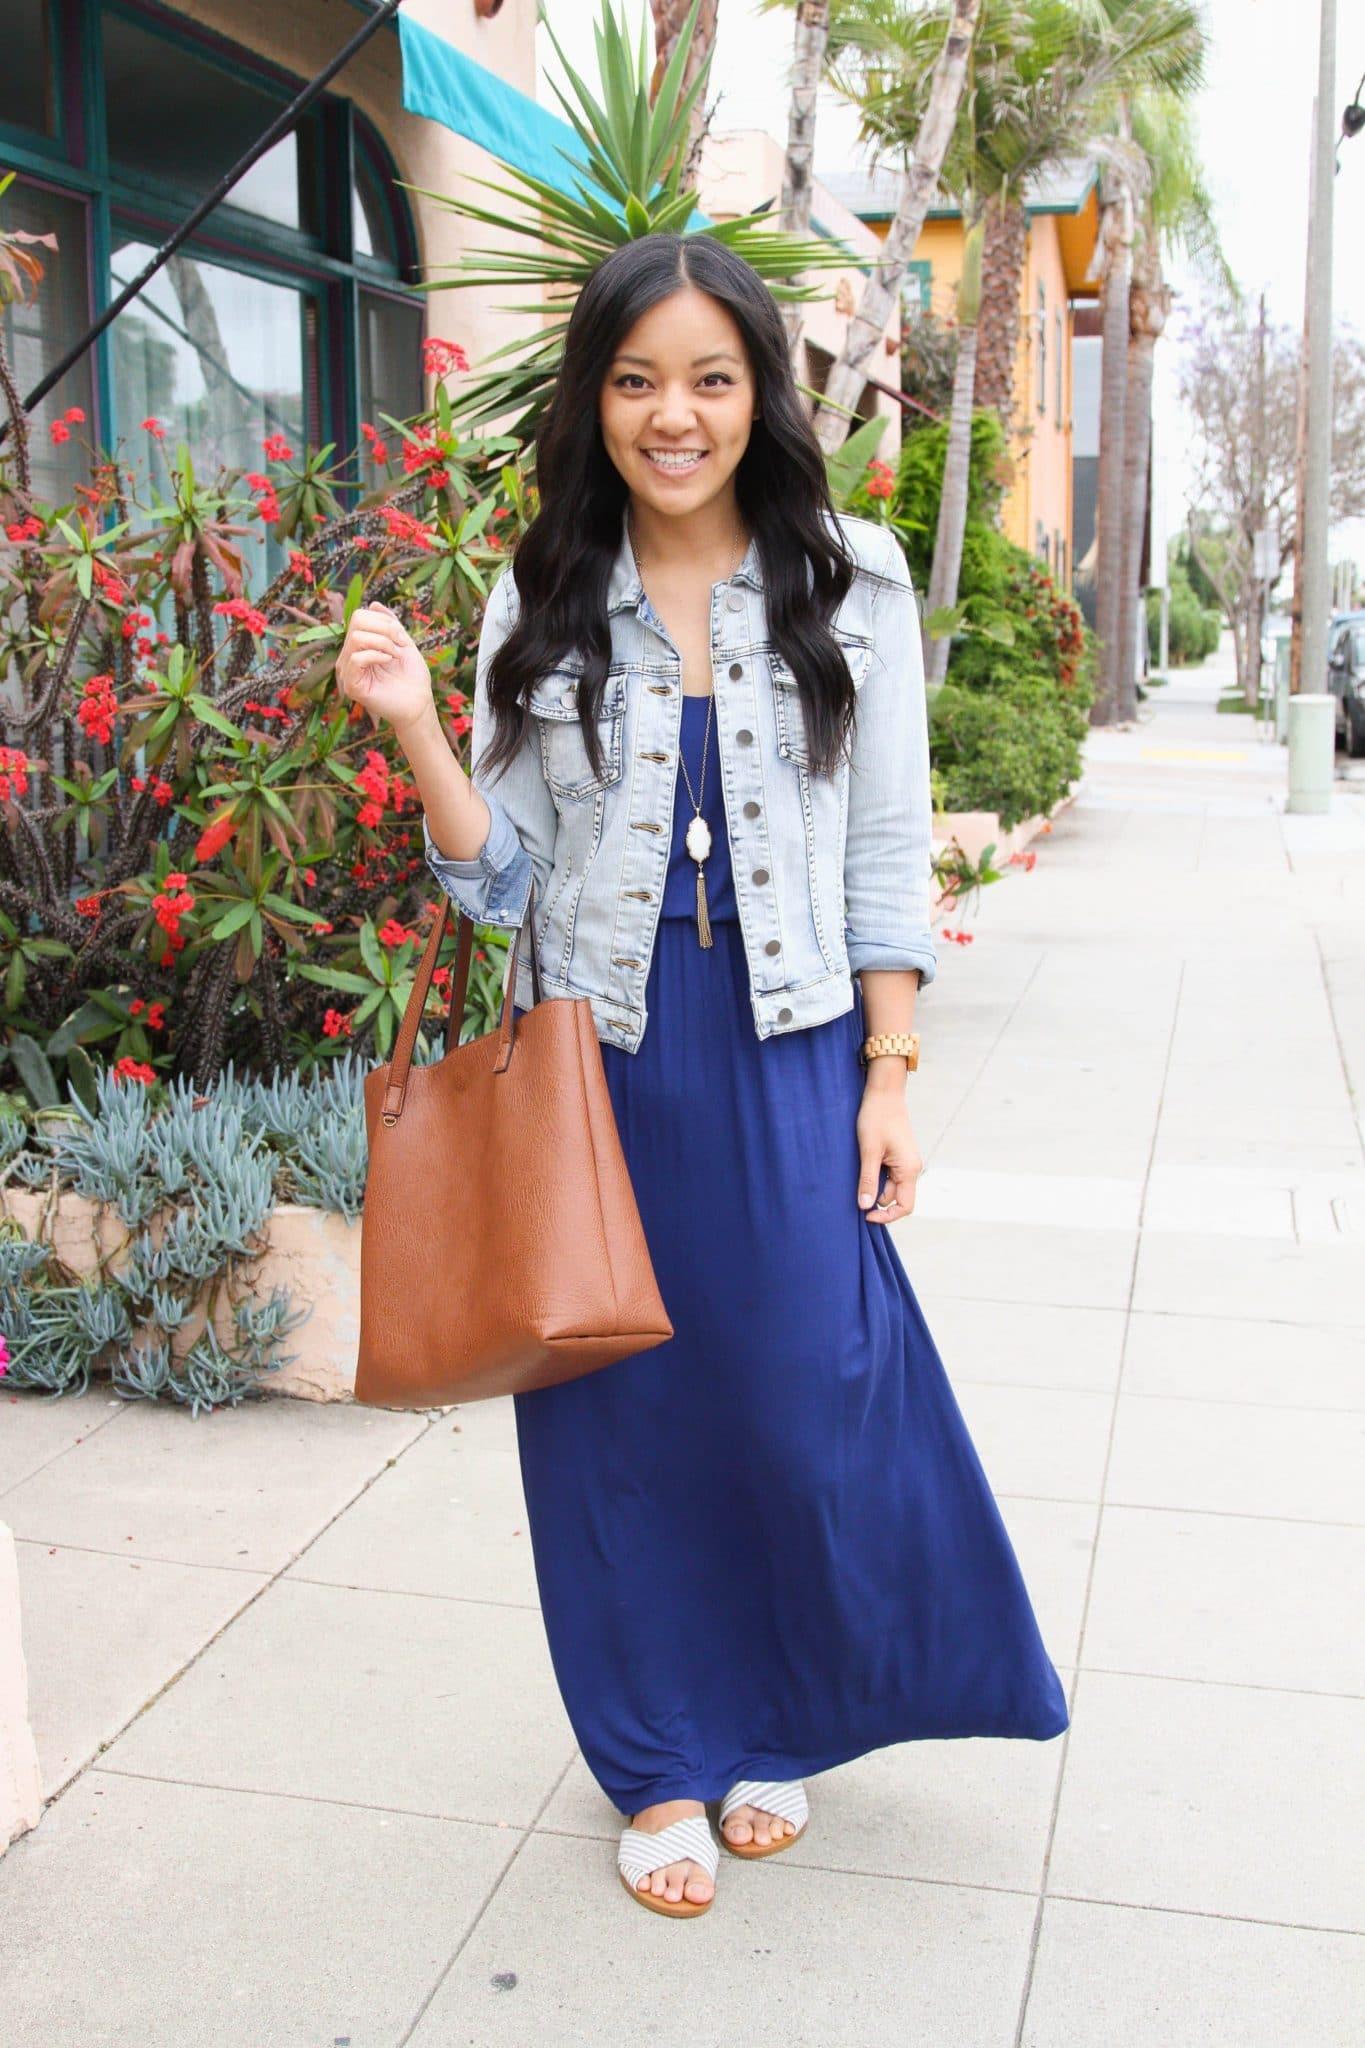 Maxi Dress Outfit: blue maxi dress + denim jacket + slip-on sandals + cognac tote + gold fringe pendant necklace